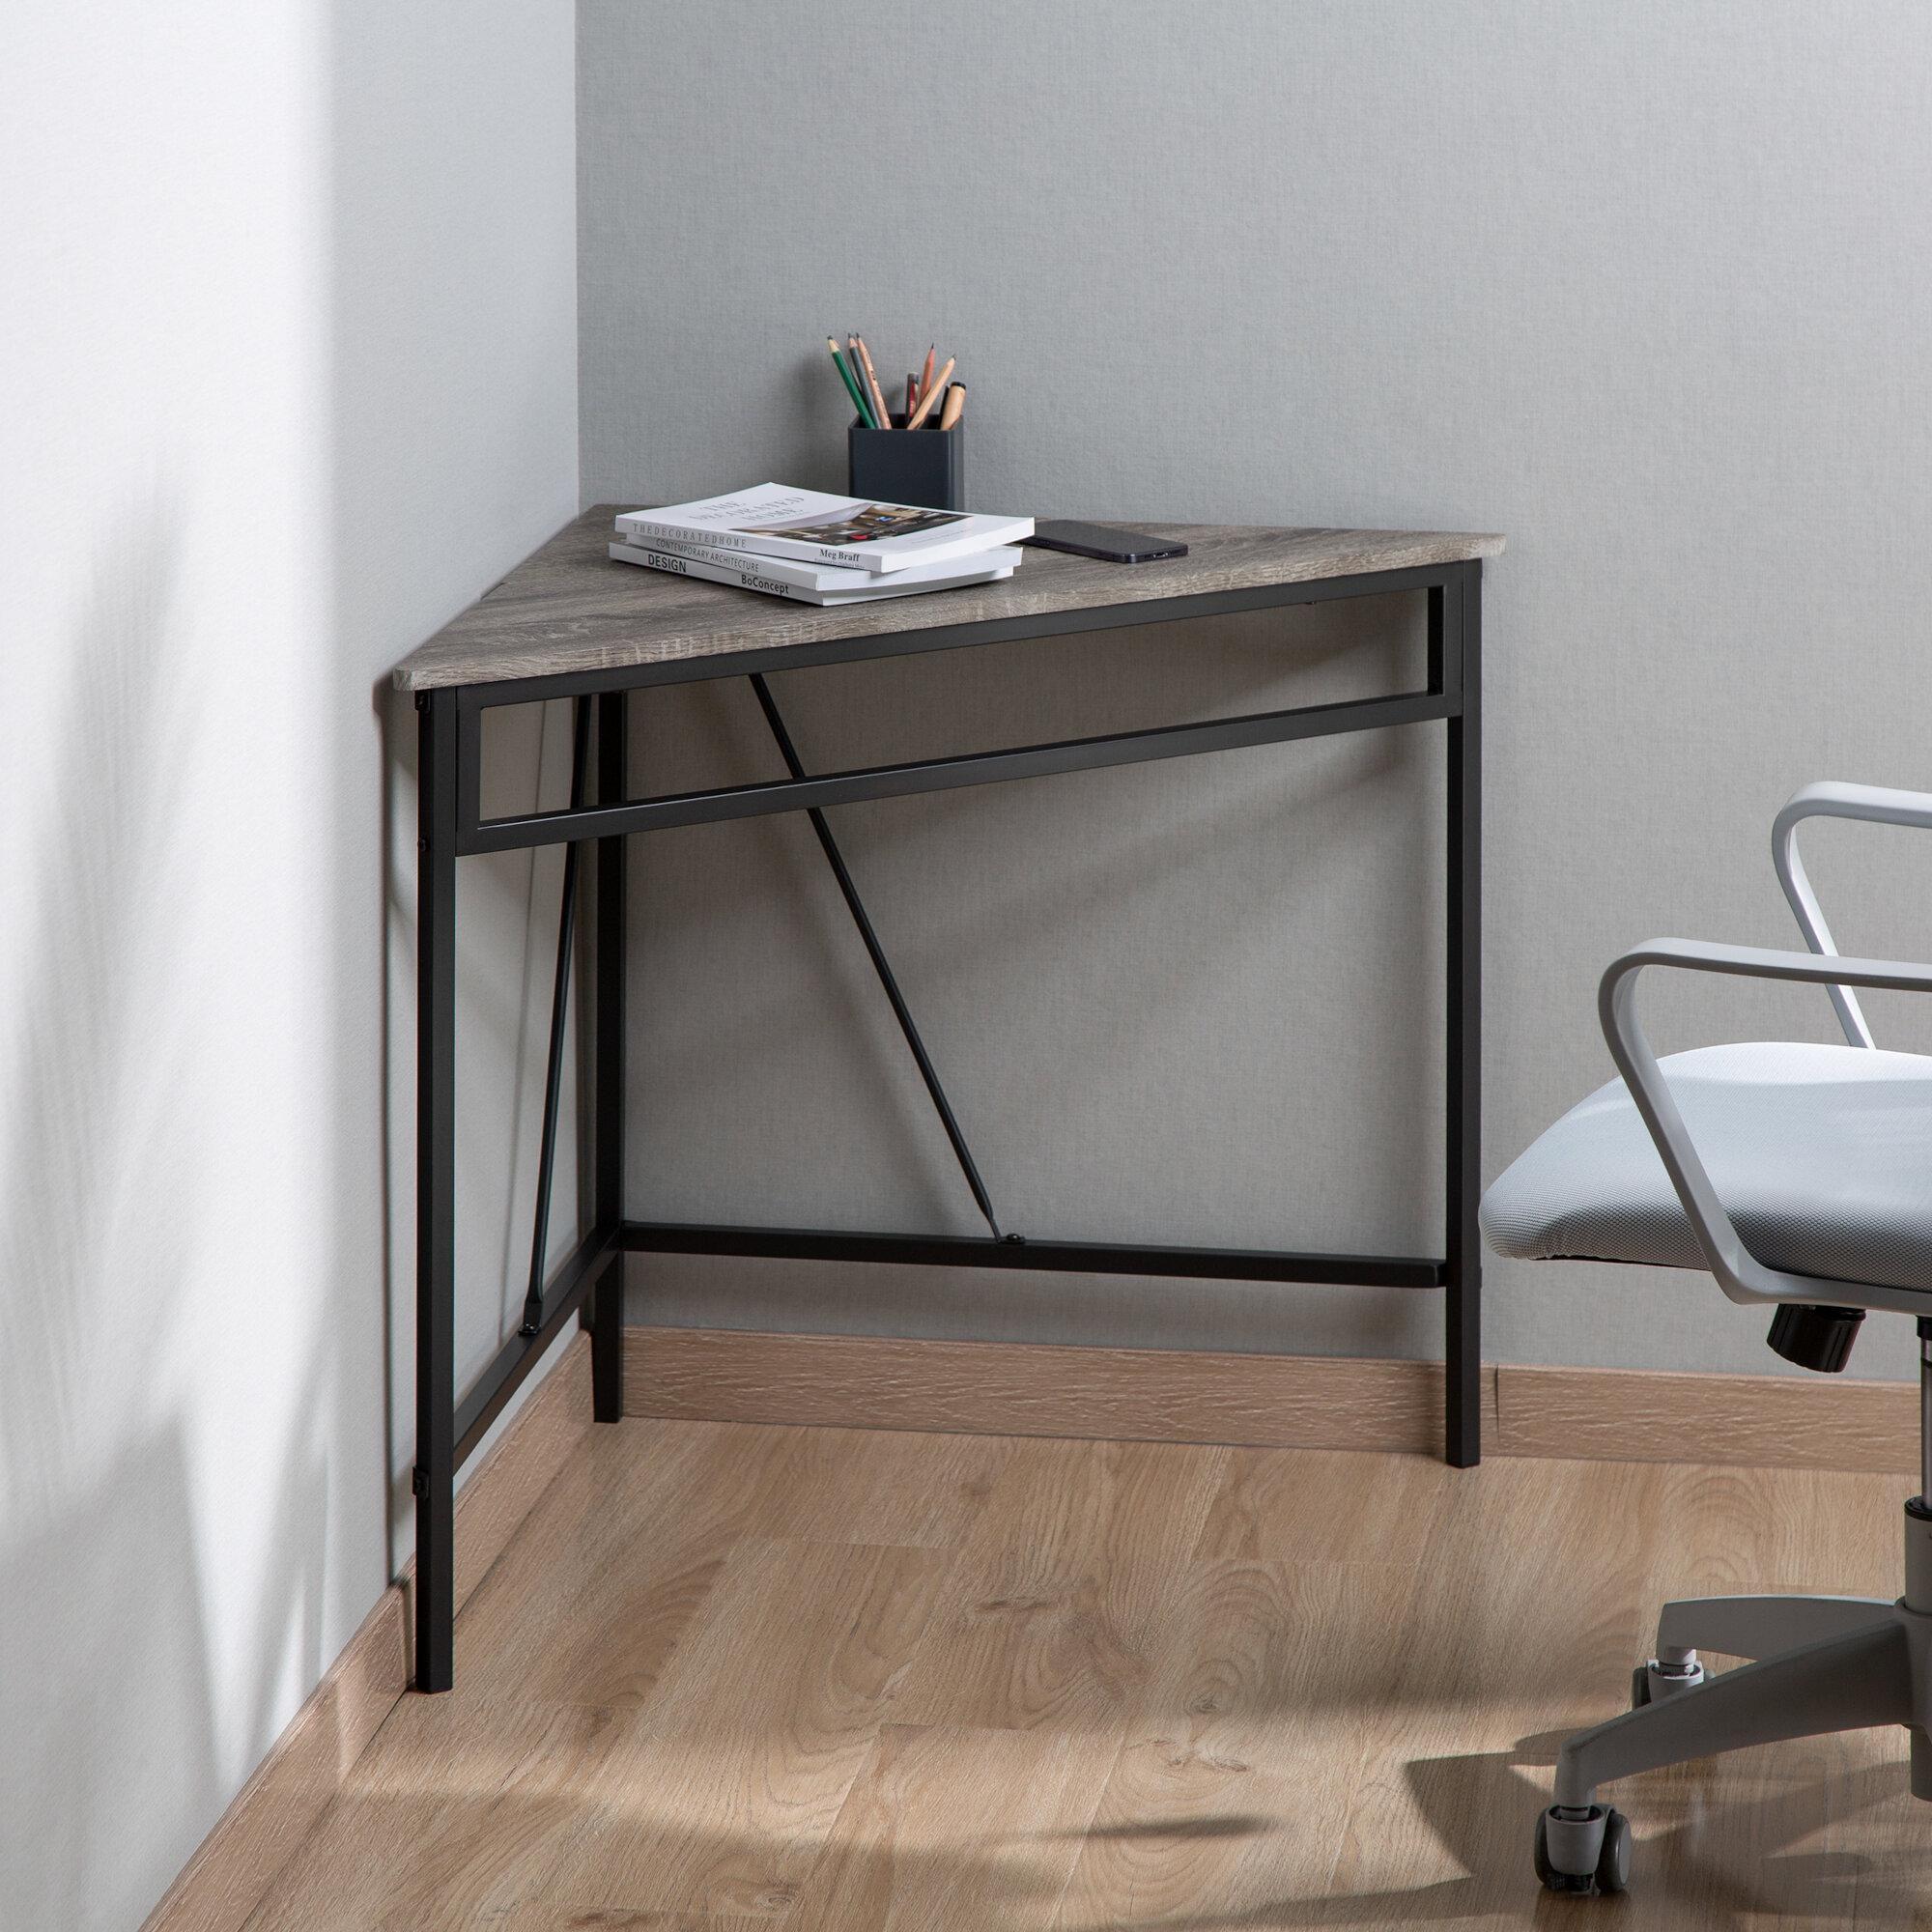 Zenvida Corner Desk, Triangle Computer Desk, Home Office Workstation for Small Space